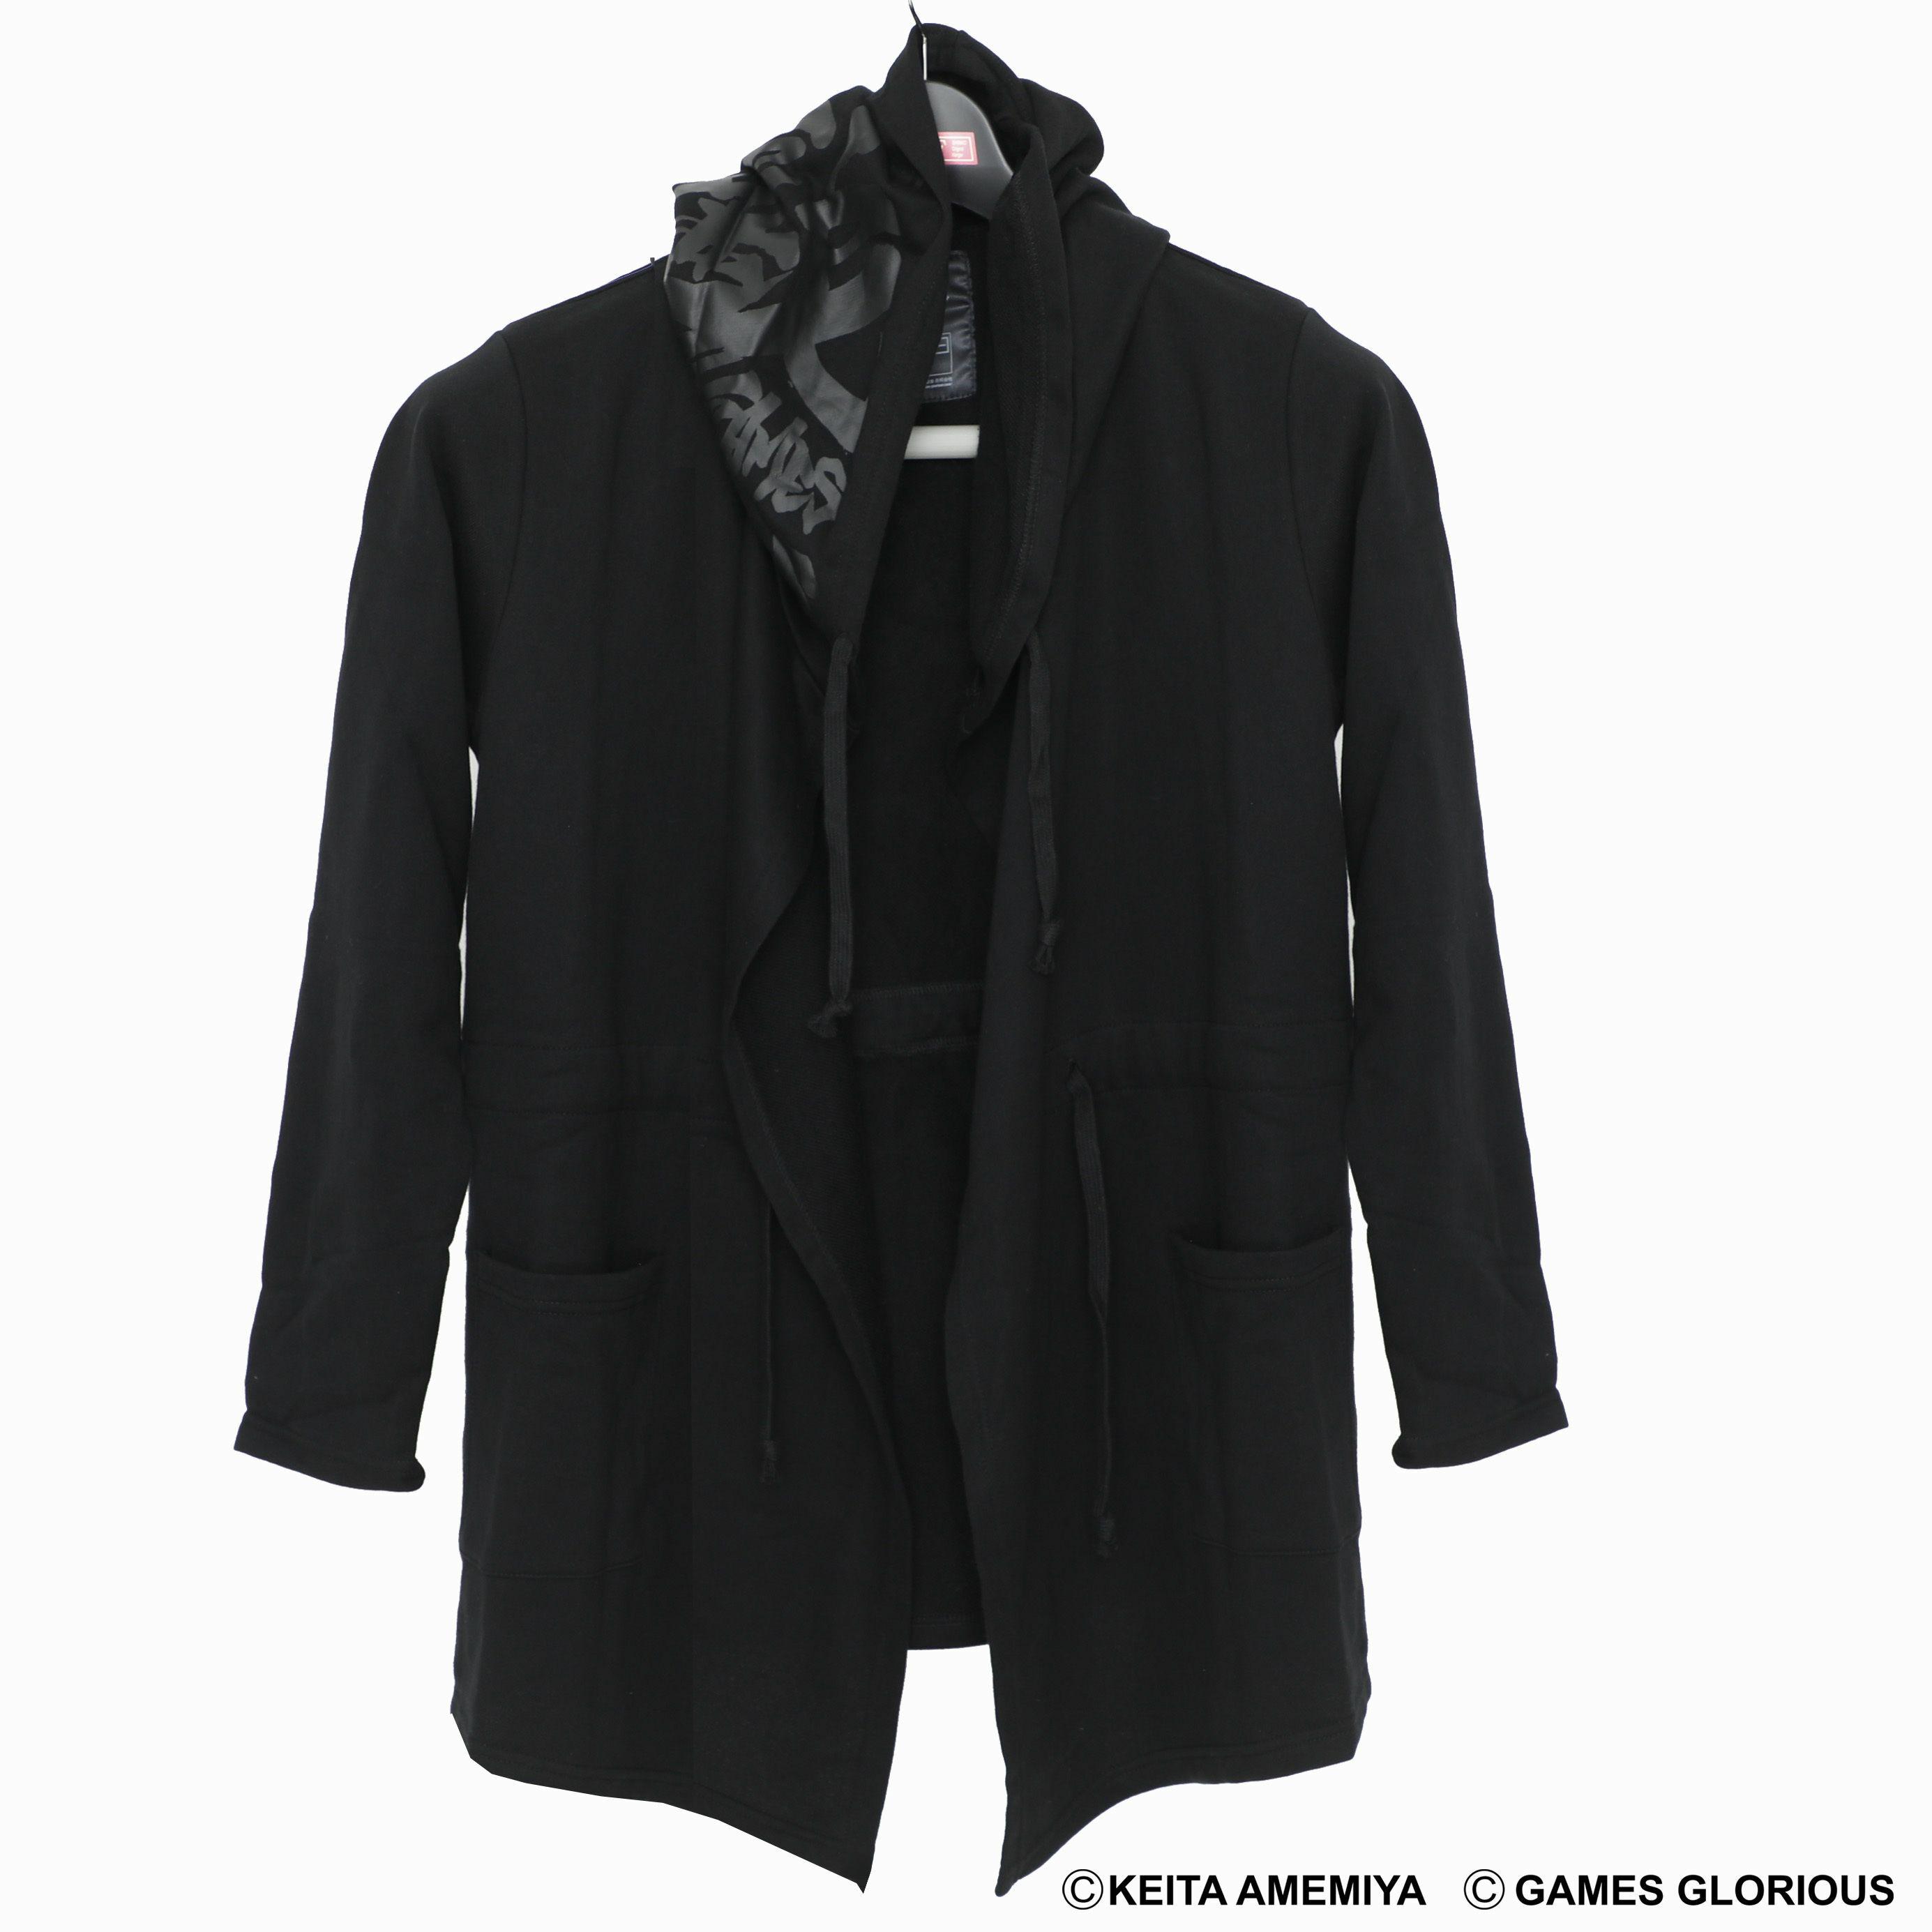 【 KEITA AMEMIYA x GAMES GLORIOUS】K.A.Mantle Cardigan 〜 MAJUU 〜 / GAMES GLORIOUS